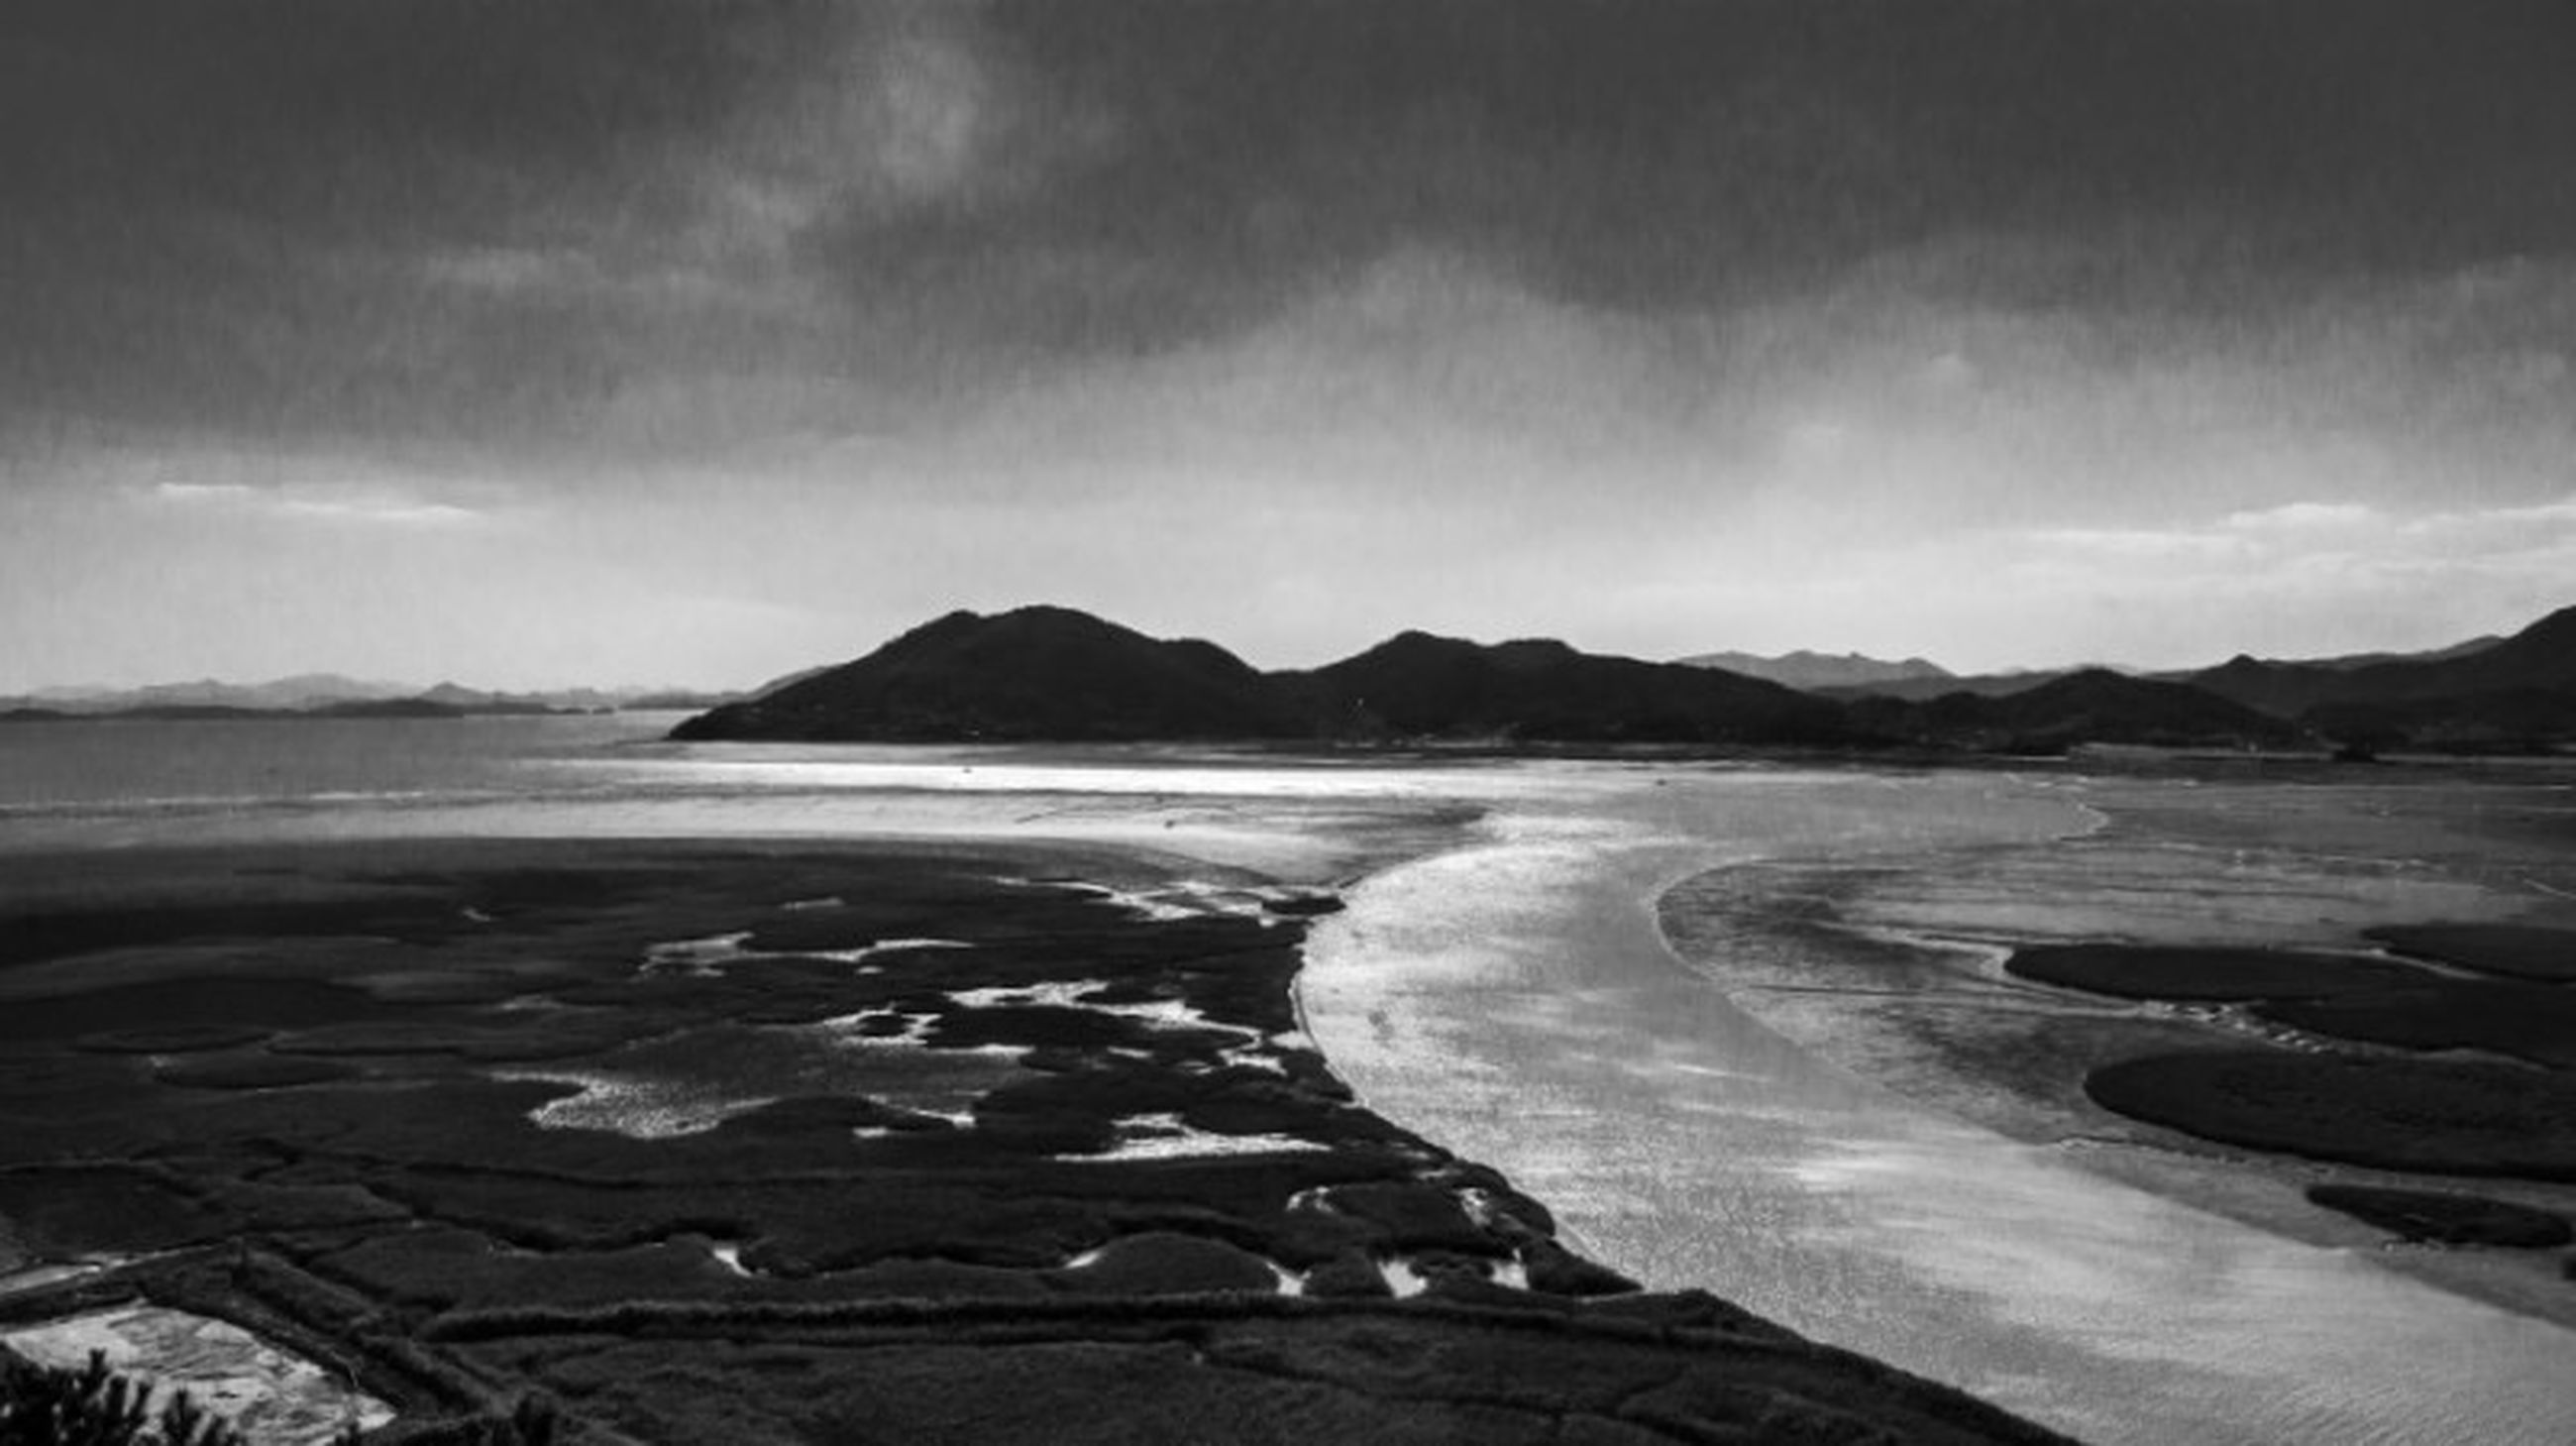 water, tranquil scene, sky, tranquility, scenics, sea, beach, beauty in nature, mountain, nature, shore, coastline, cloud - sky, idyllic, sand, rock - object, non-urban scene, cloud, remote, day